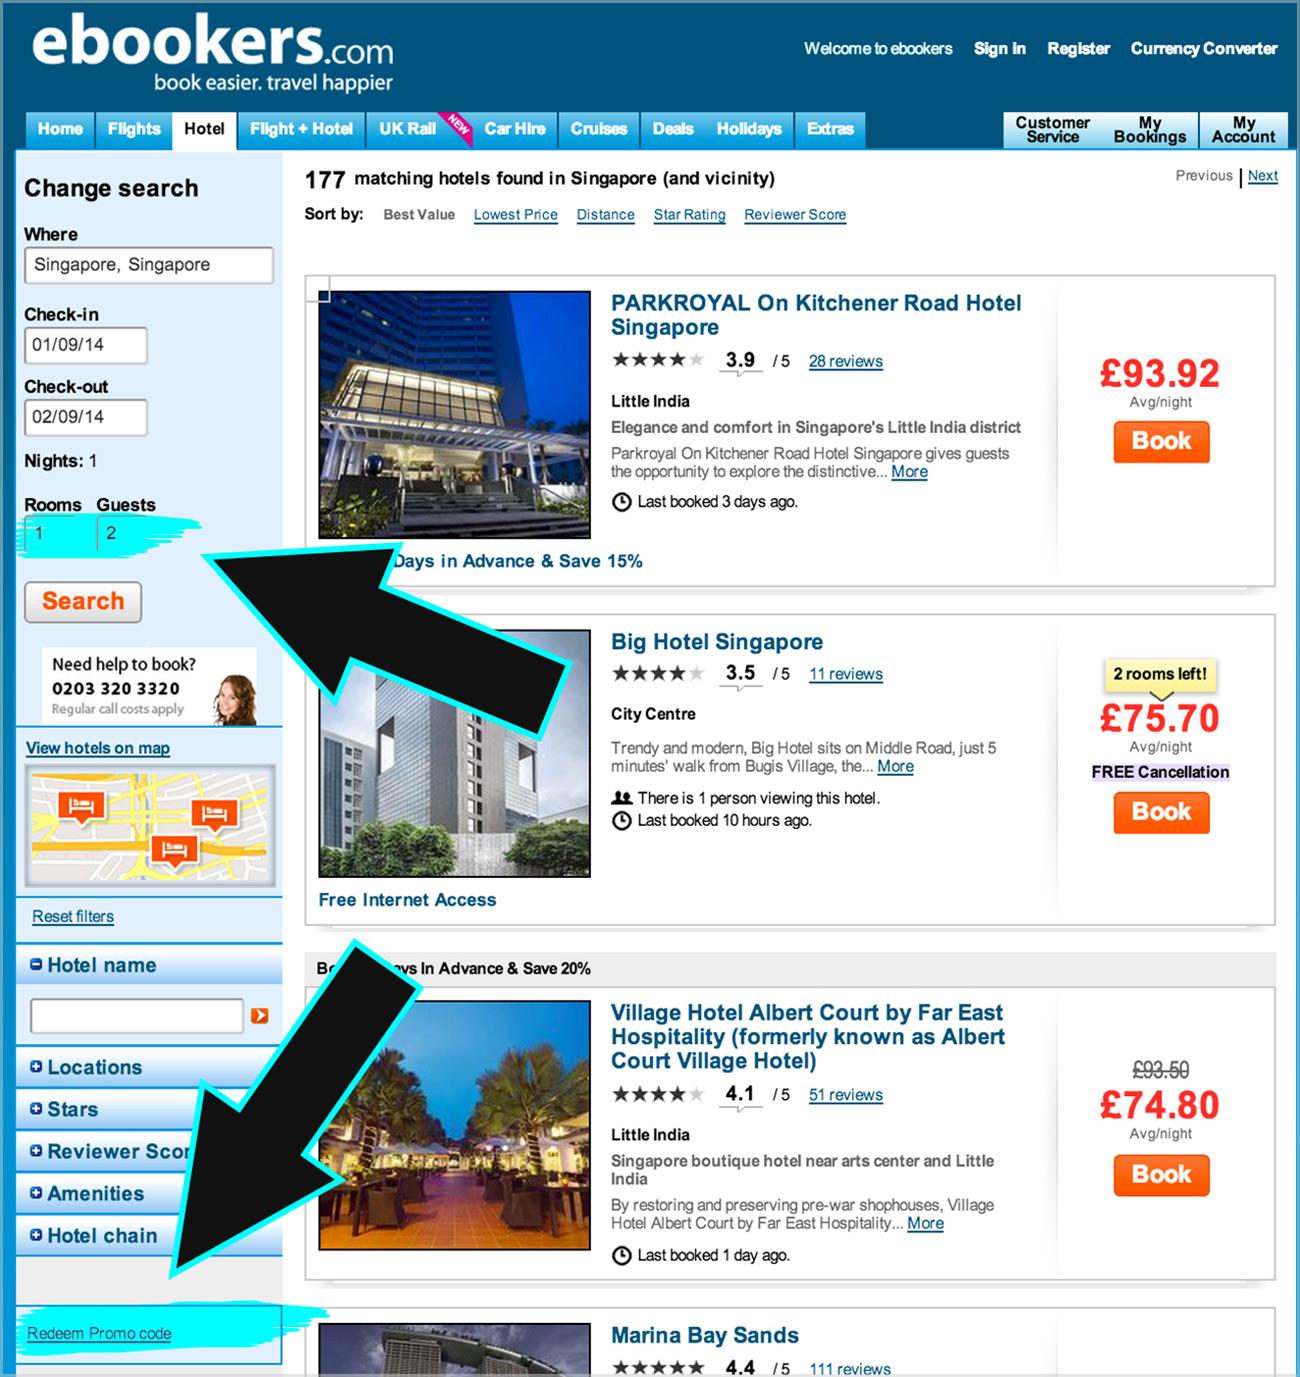 ebookers-promocode-2